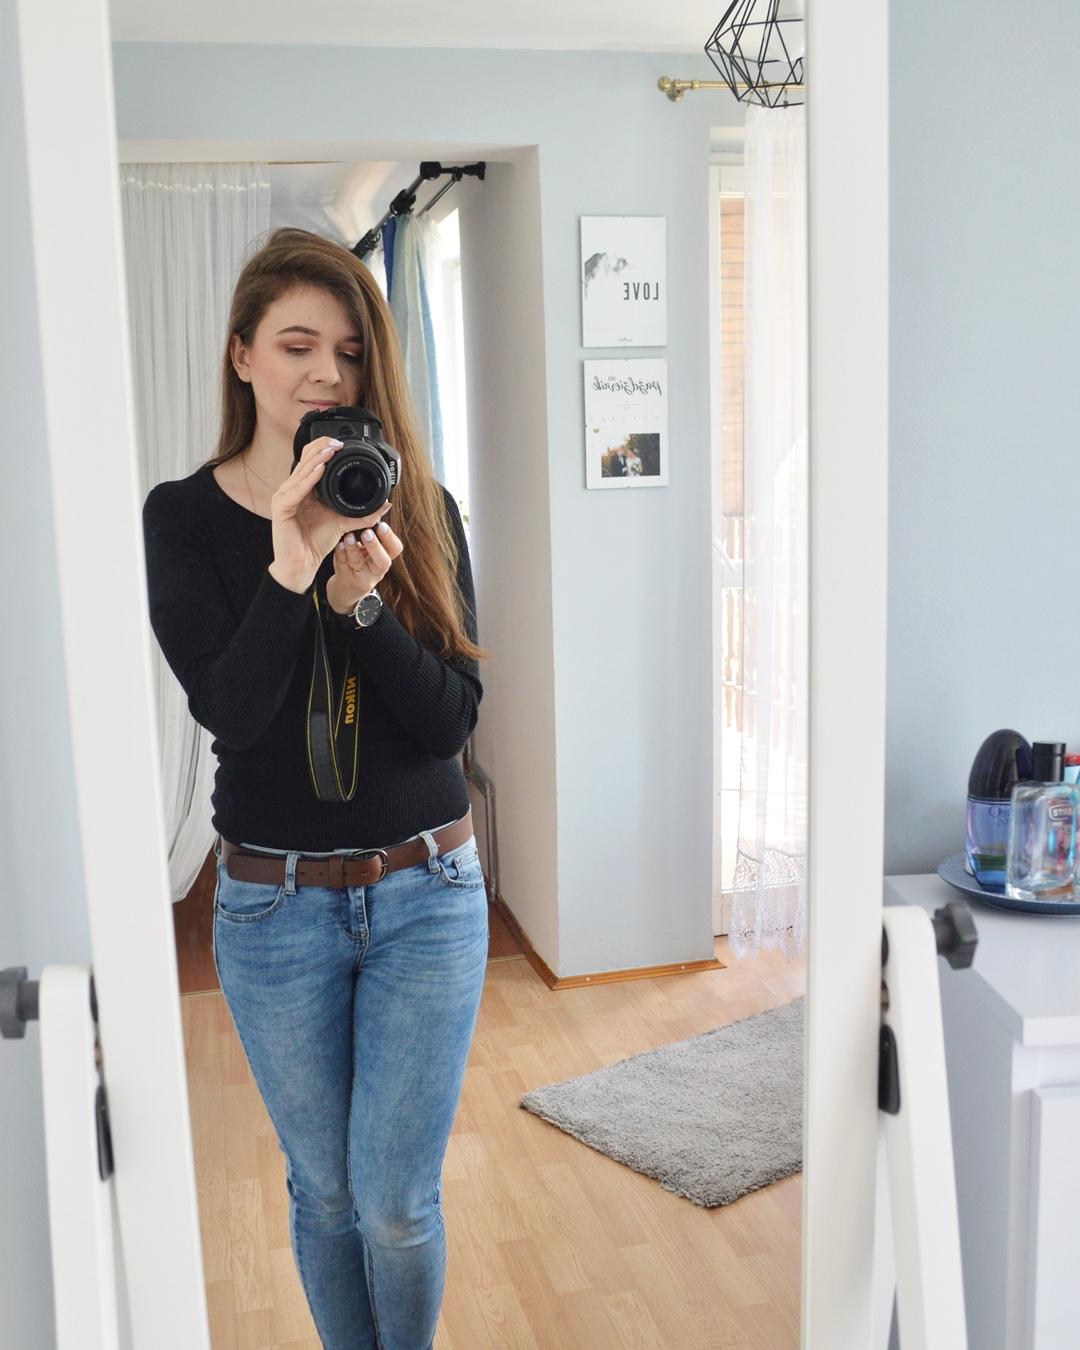 podsumowanie roku, plany i cele delishe blog